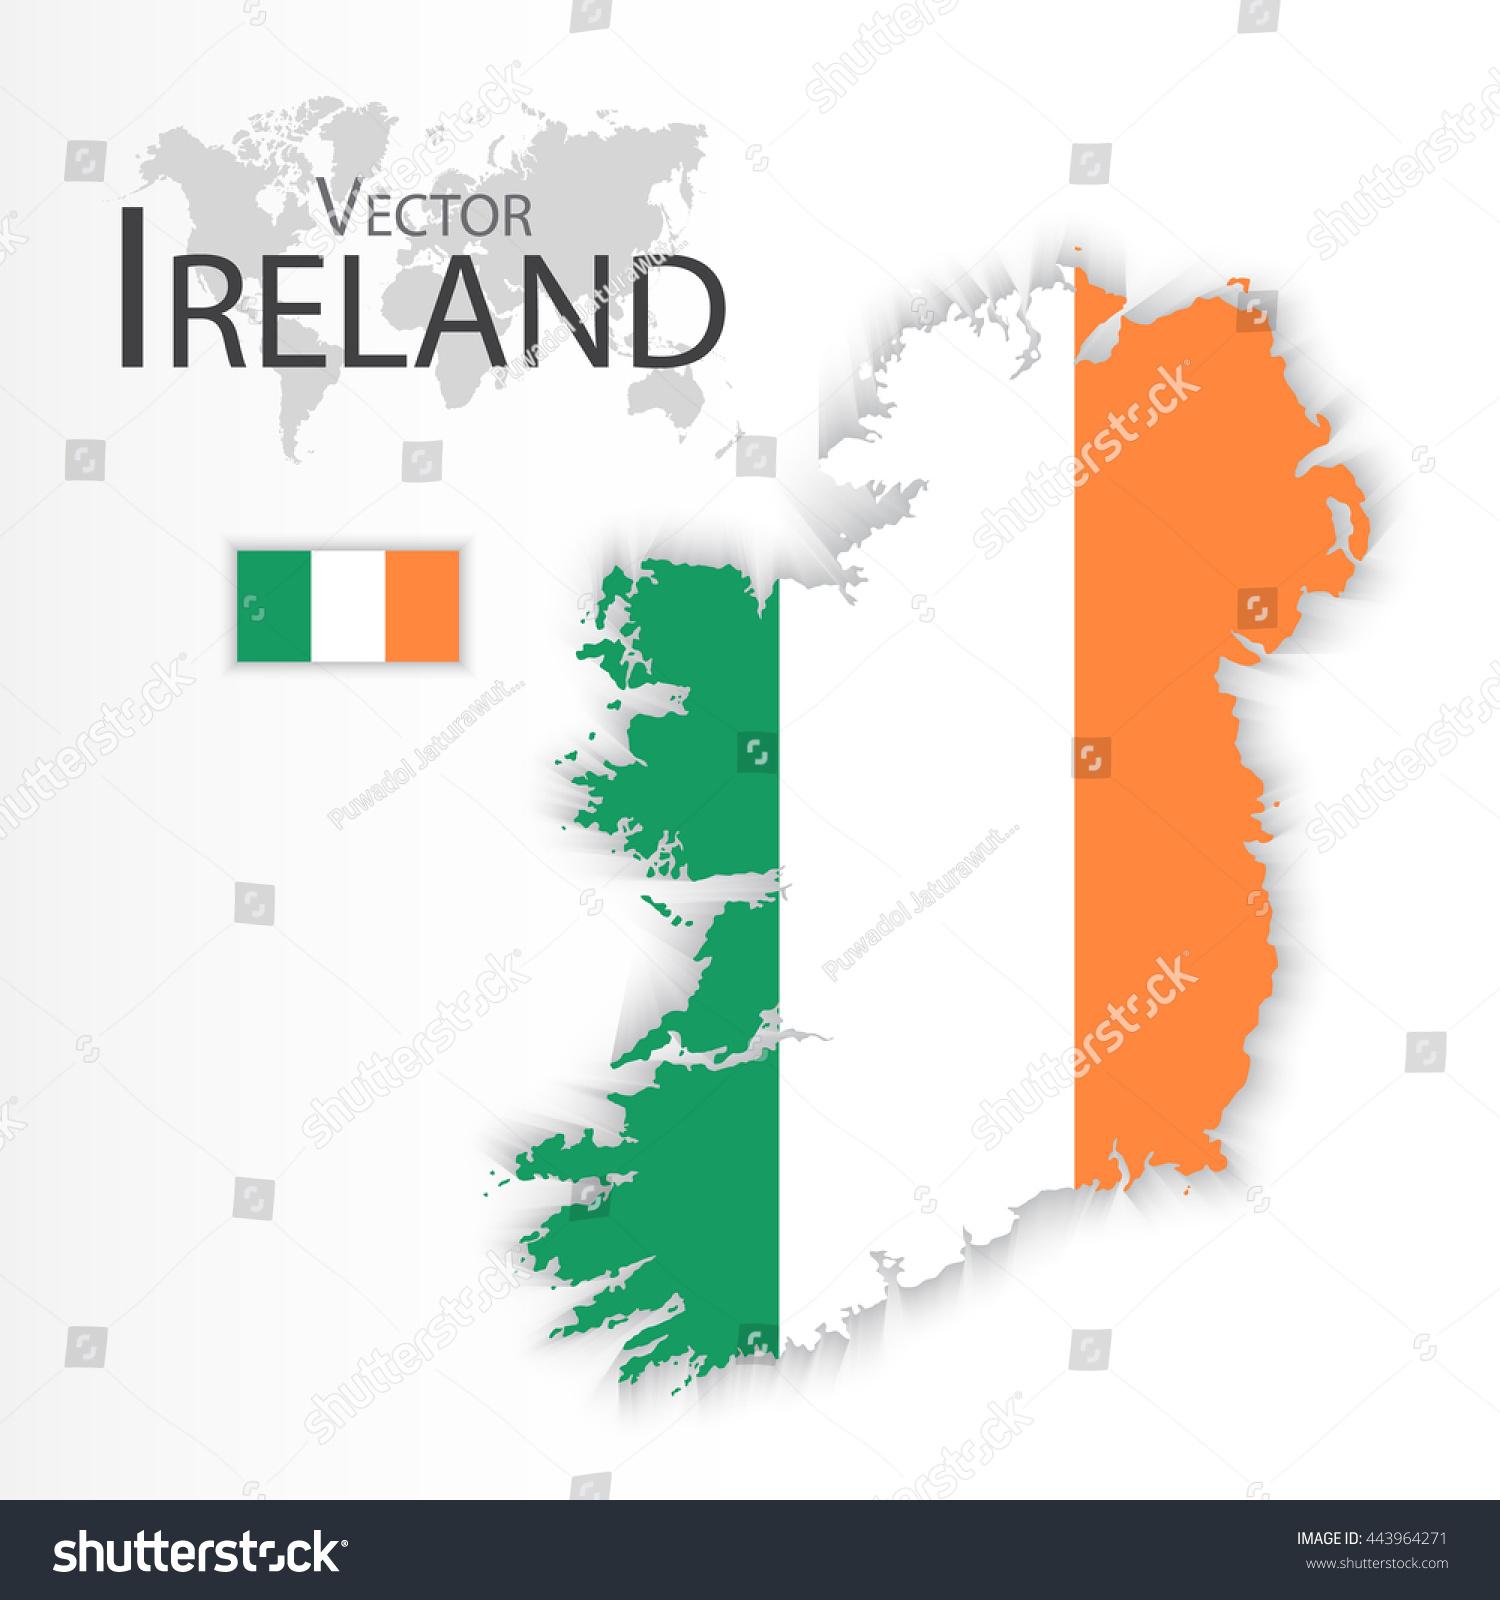 republic ireland flag map transportation tourism stock vector